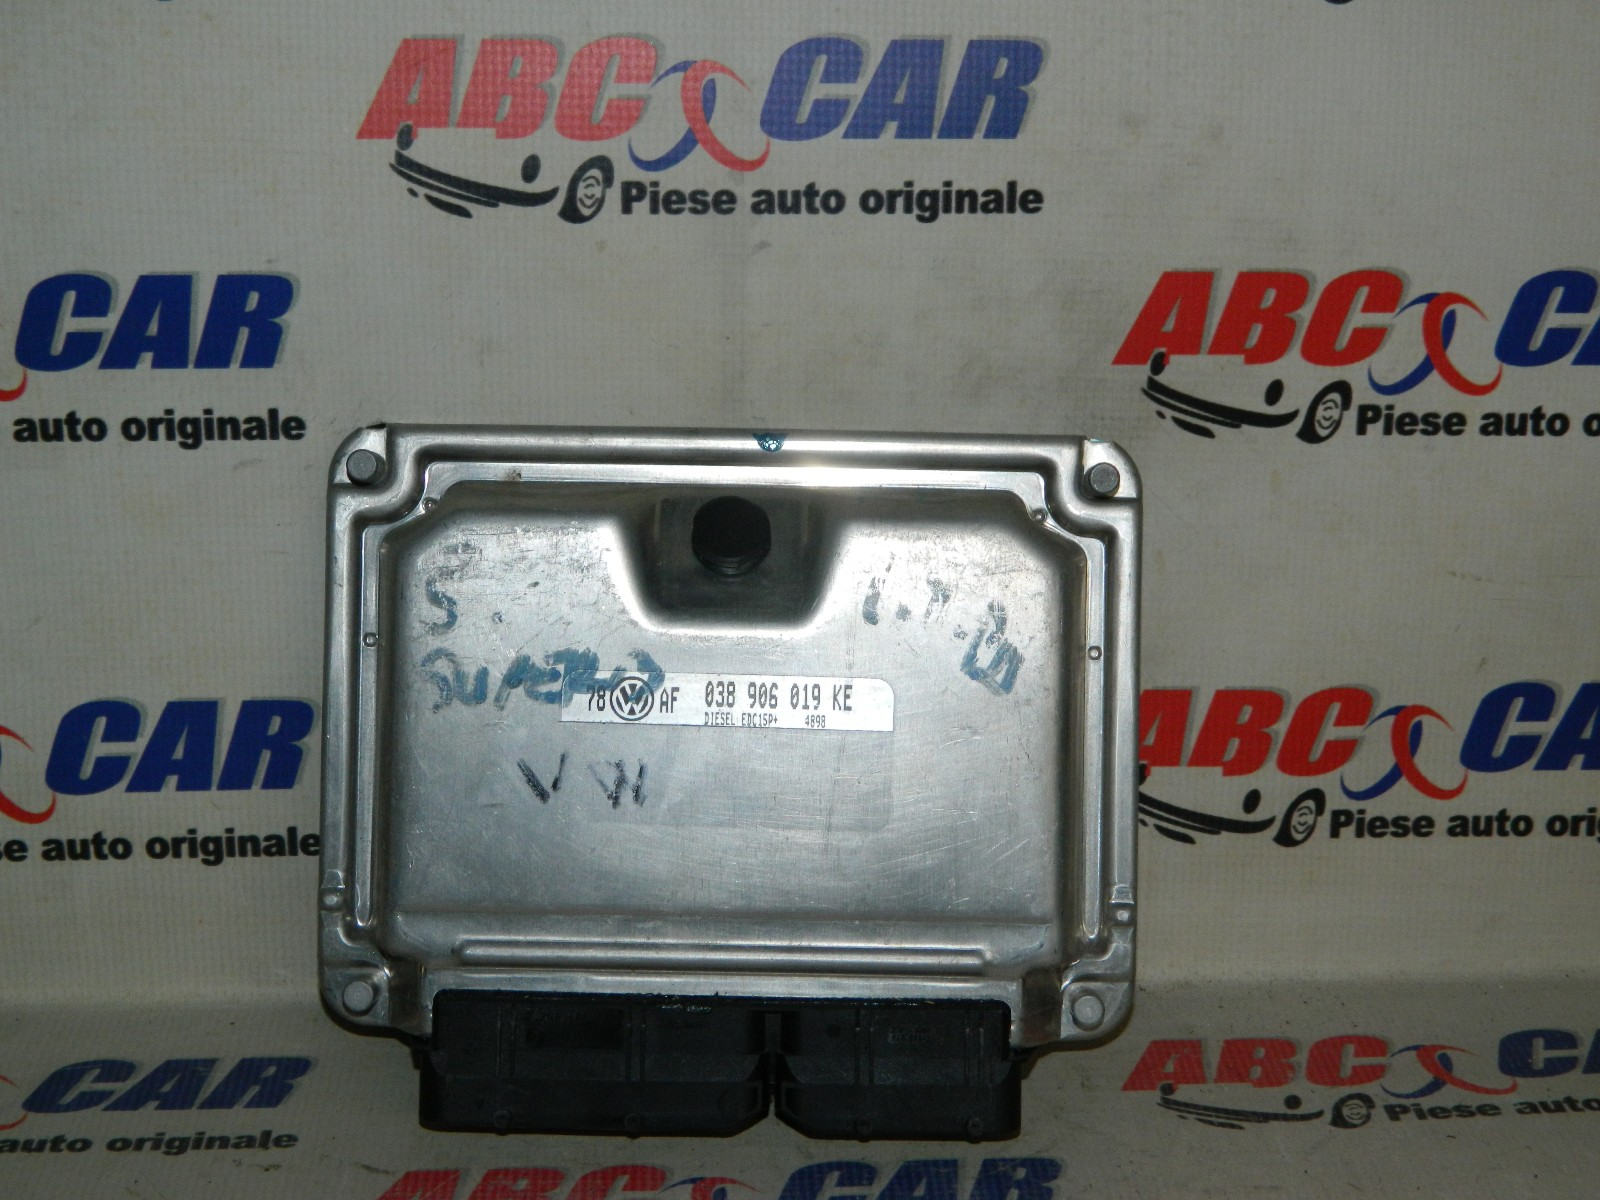 Calculator Motor Vw Passat B5 1 9 Tdi 131cp Awx 038906019ke Piese